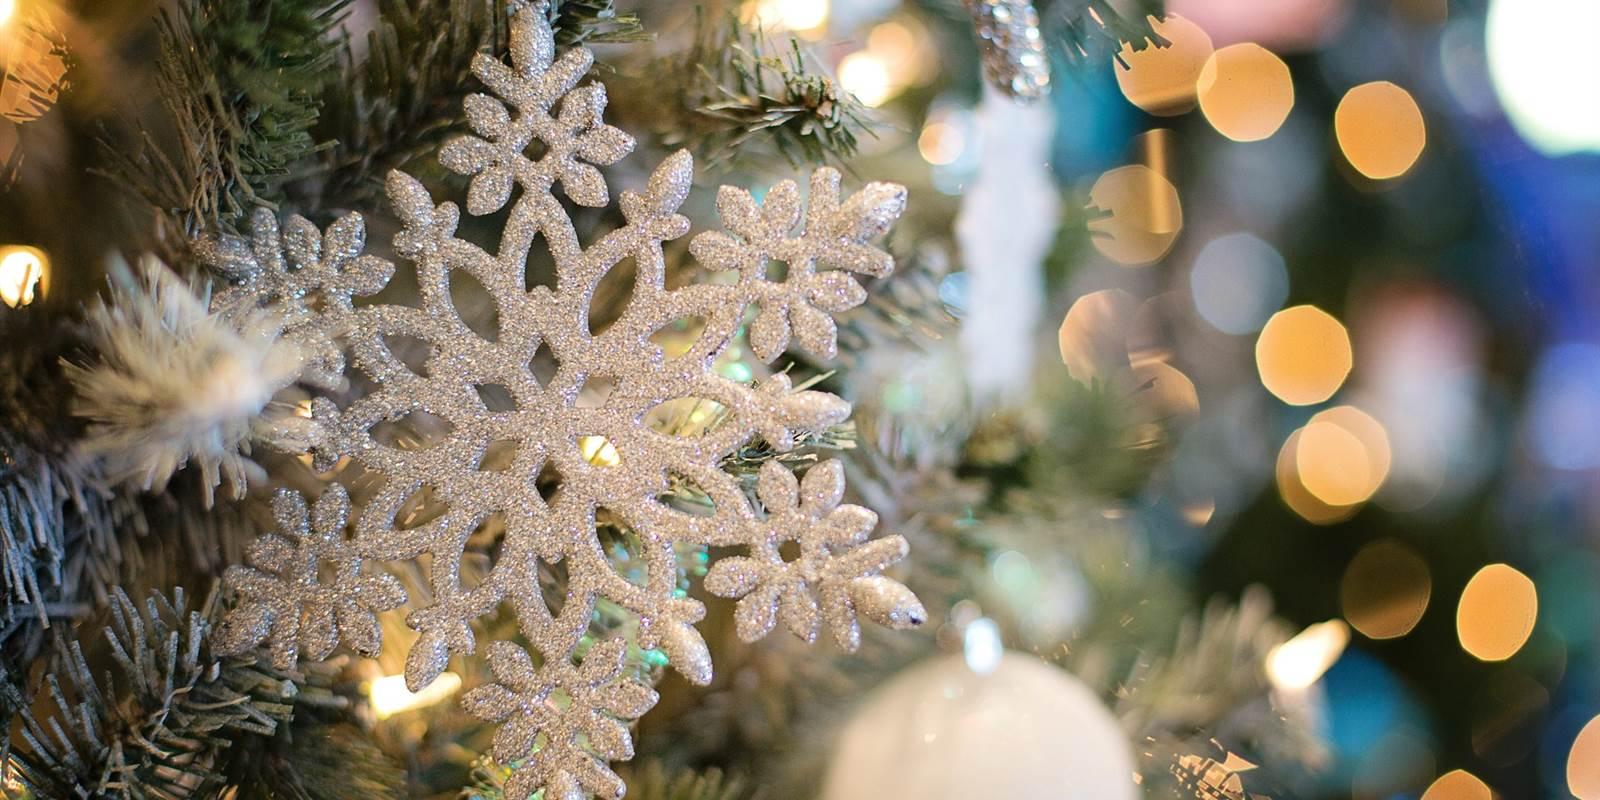 snowflake 1823942 1920